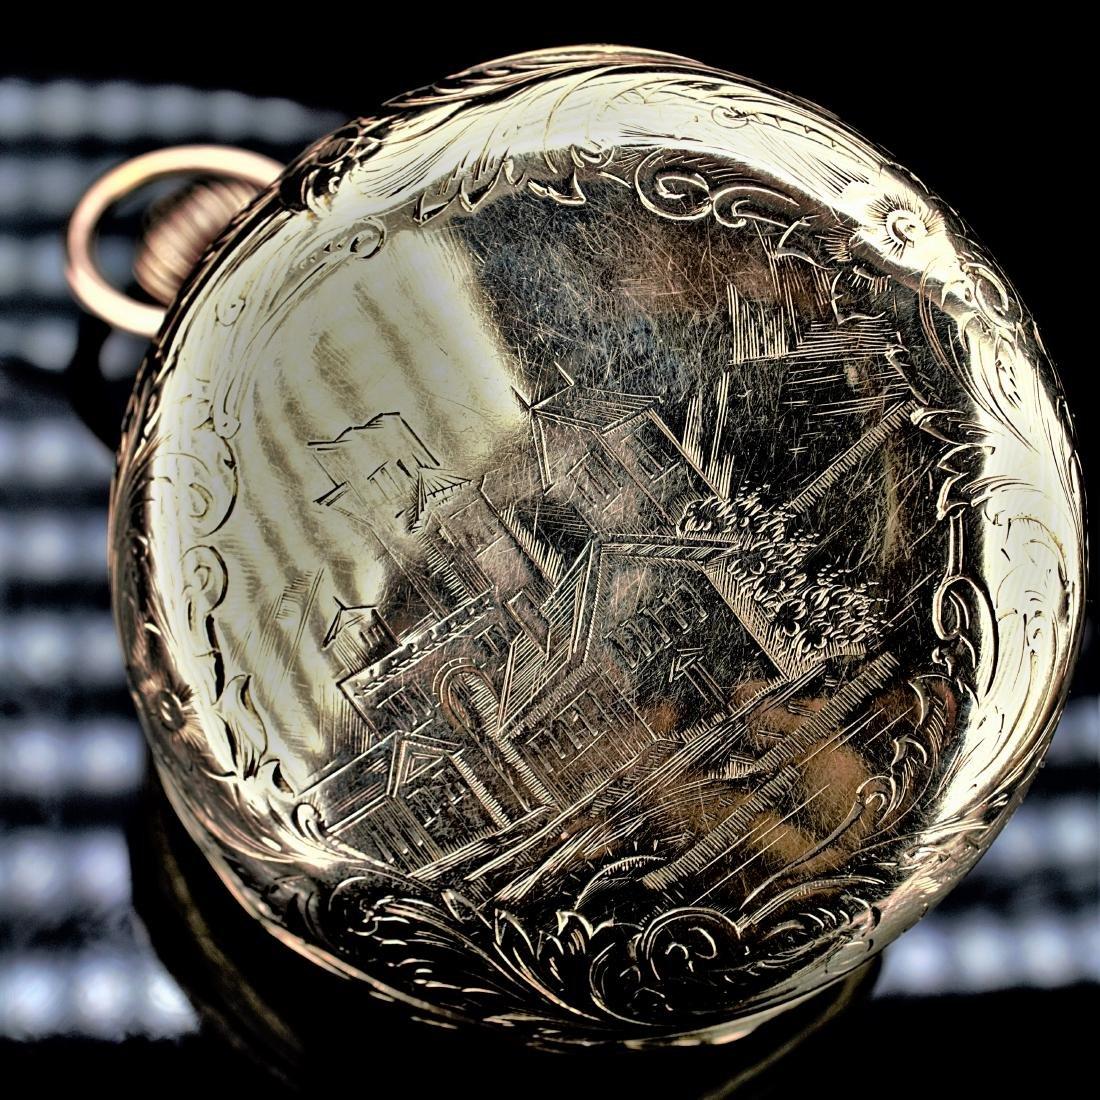 Waltham 14k YG Pocket Watch 6S